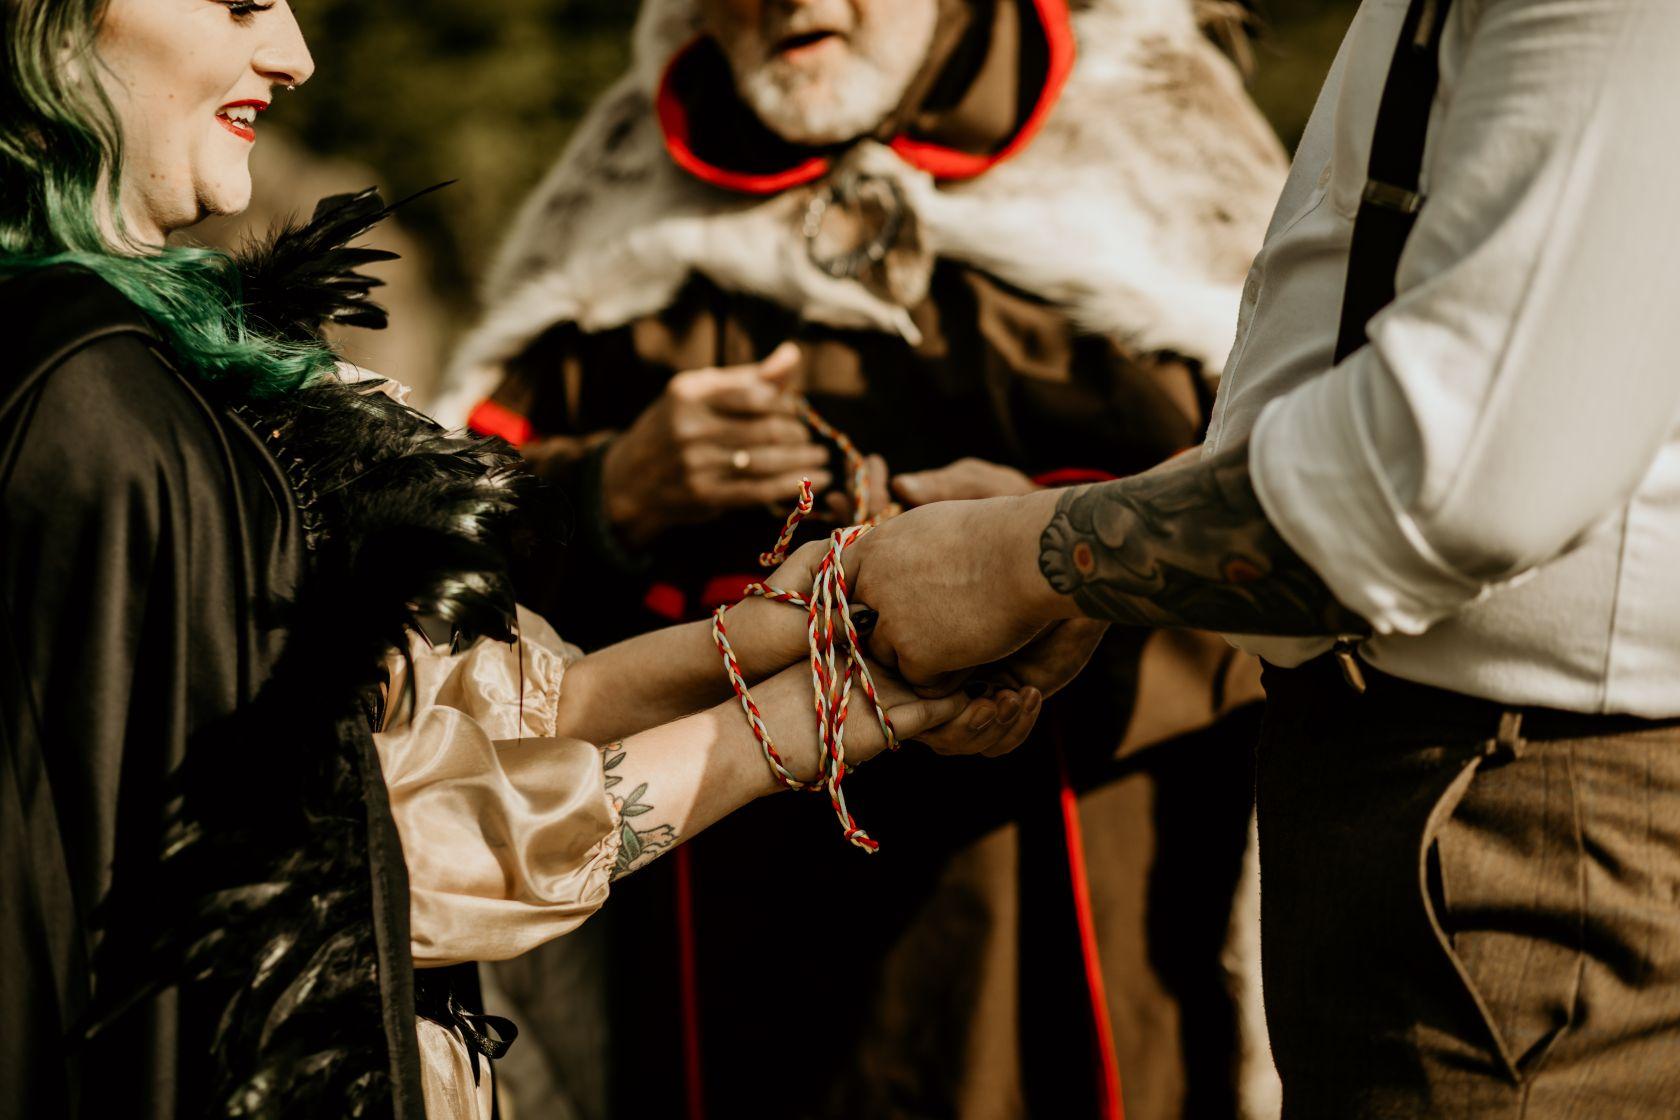 alternative fairytale wedding- snow white wedding- charlotte laurie designs-chloe mary photo- unconventional wedding- alternative wedding inspiration-handfasting ceremony- handfasting wedding